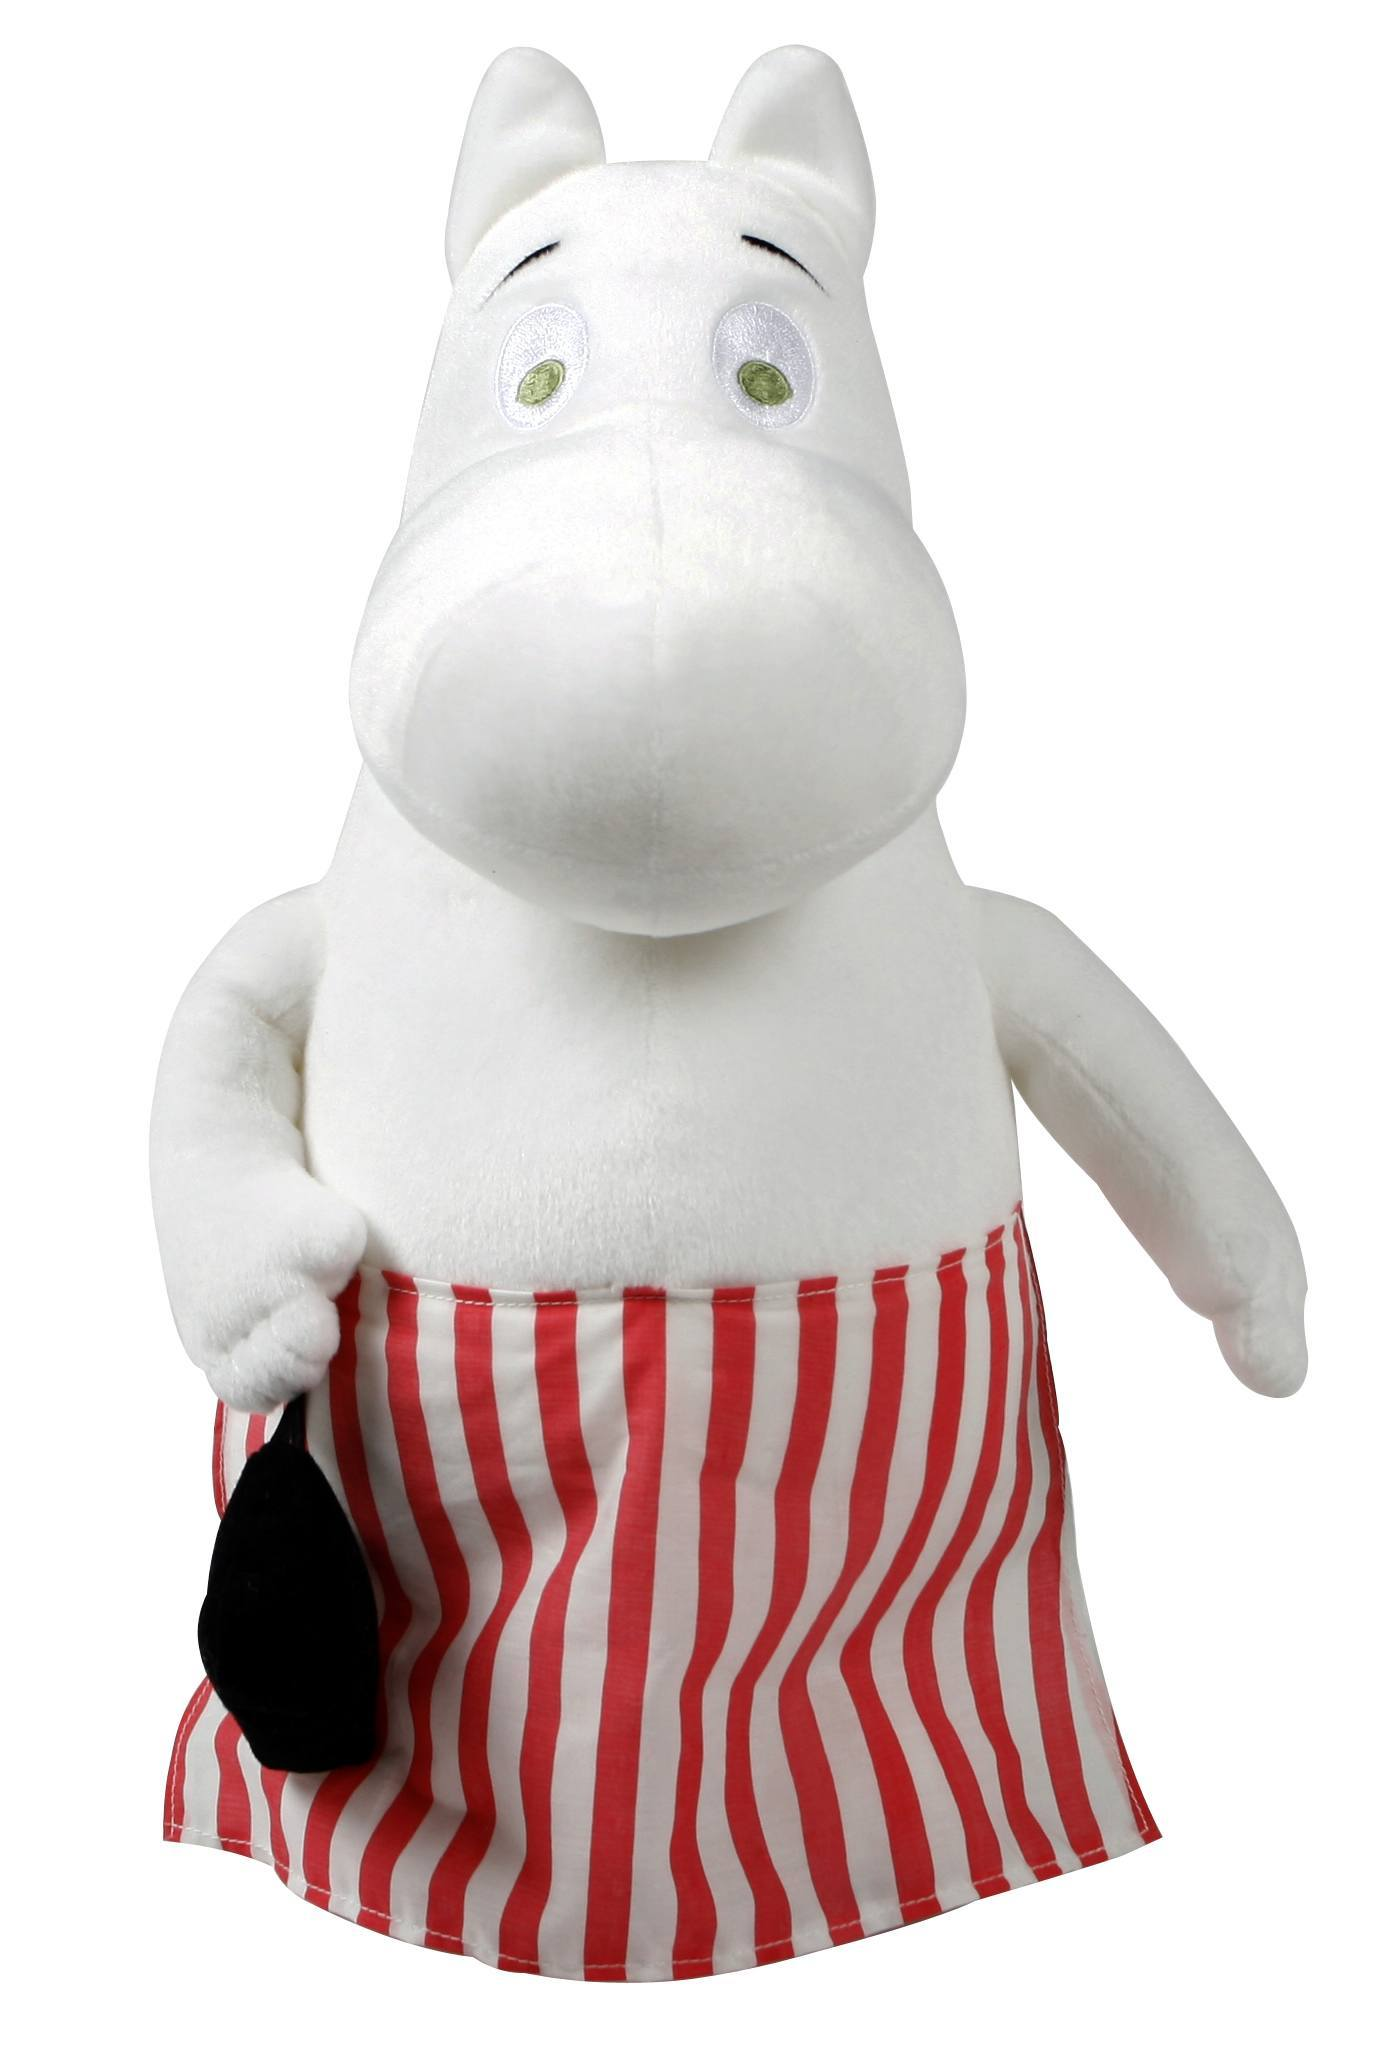 Martinex Moominmamma plush 20cm